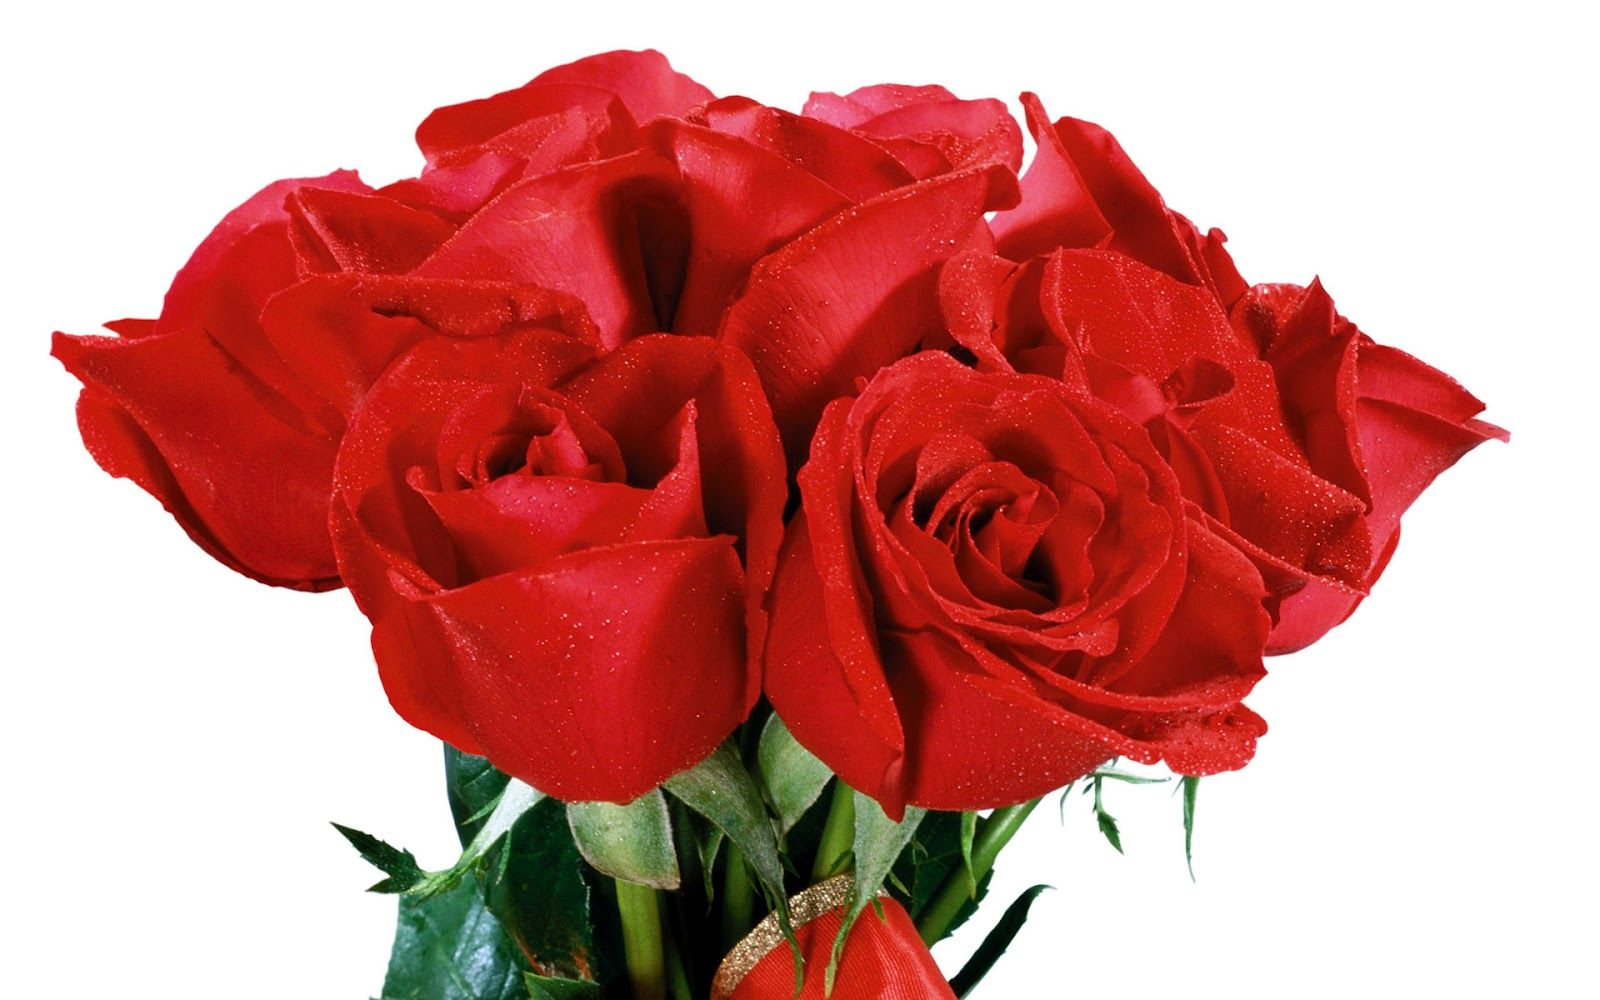 صور ورد جديده ورد صور ورد جوري خلفيات ورد جميلة باقات ورود روعه 2015 اجمل ورد جوري بكل الالوان Flowers Flowers Red Roses Rose